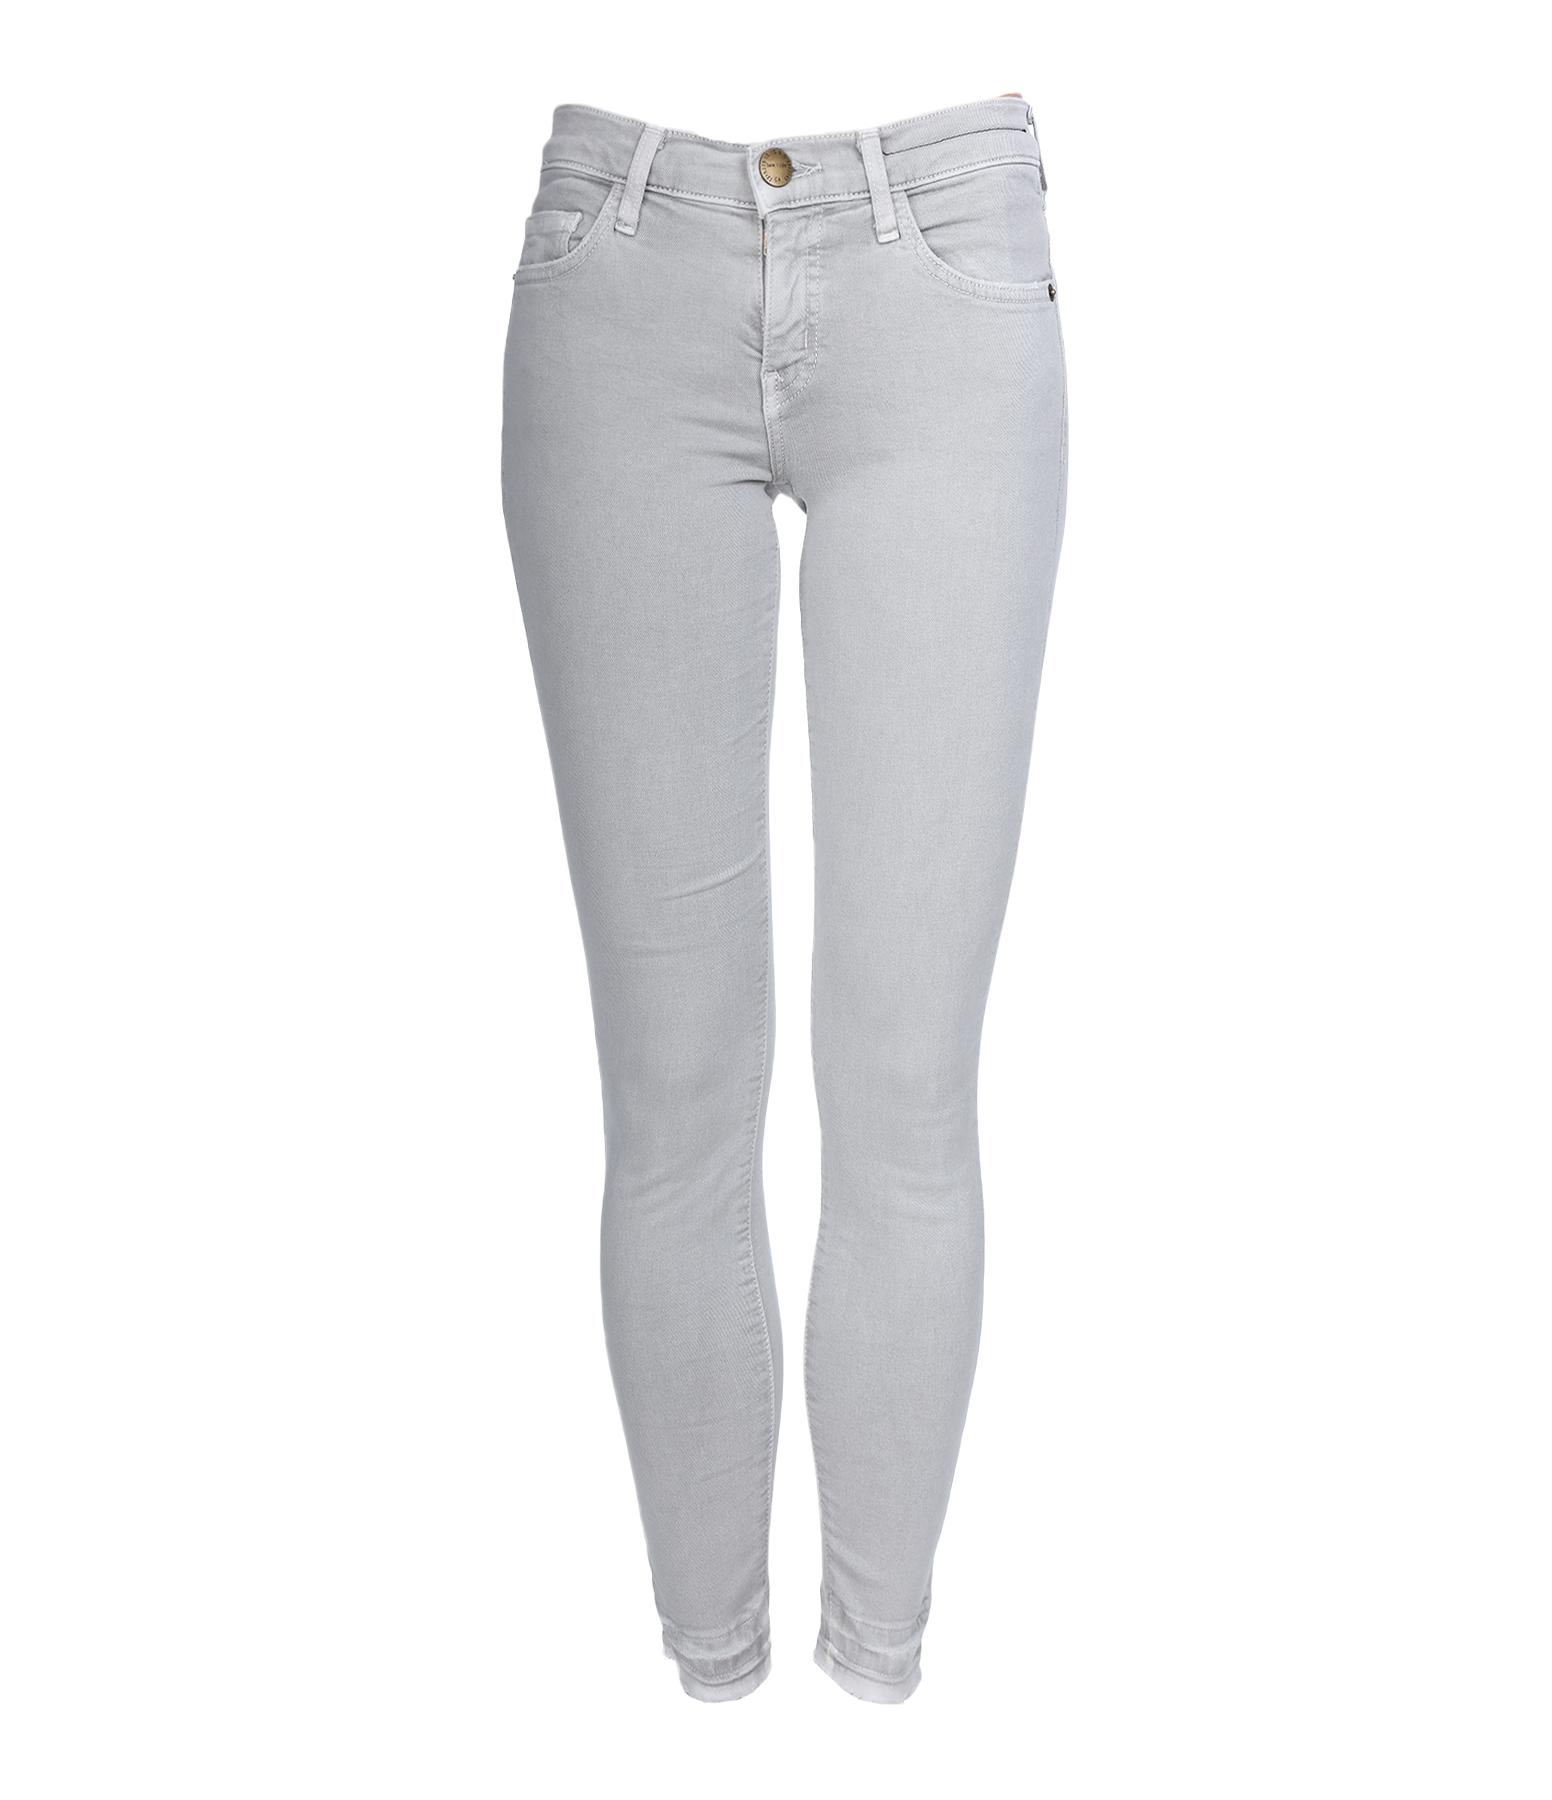 Jean The Stiletto Light Grey